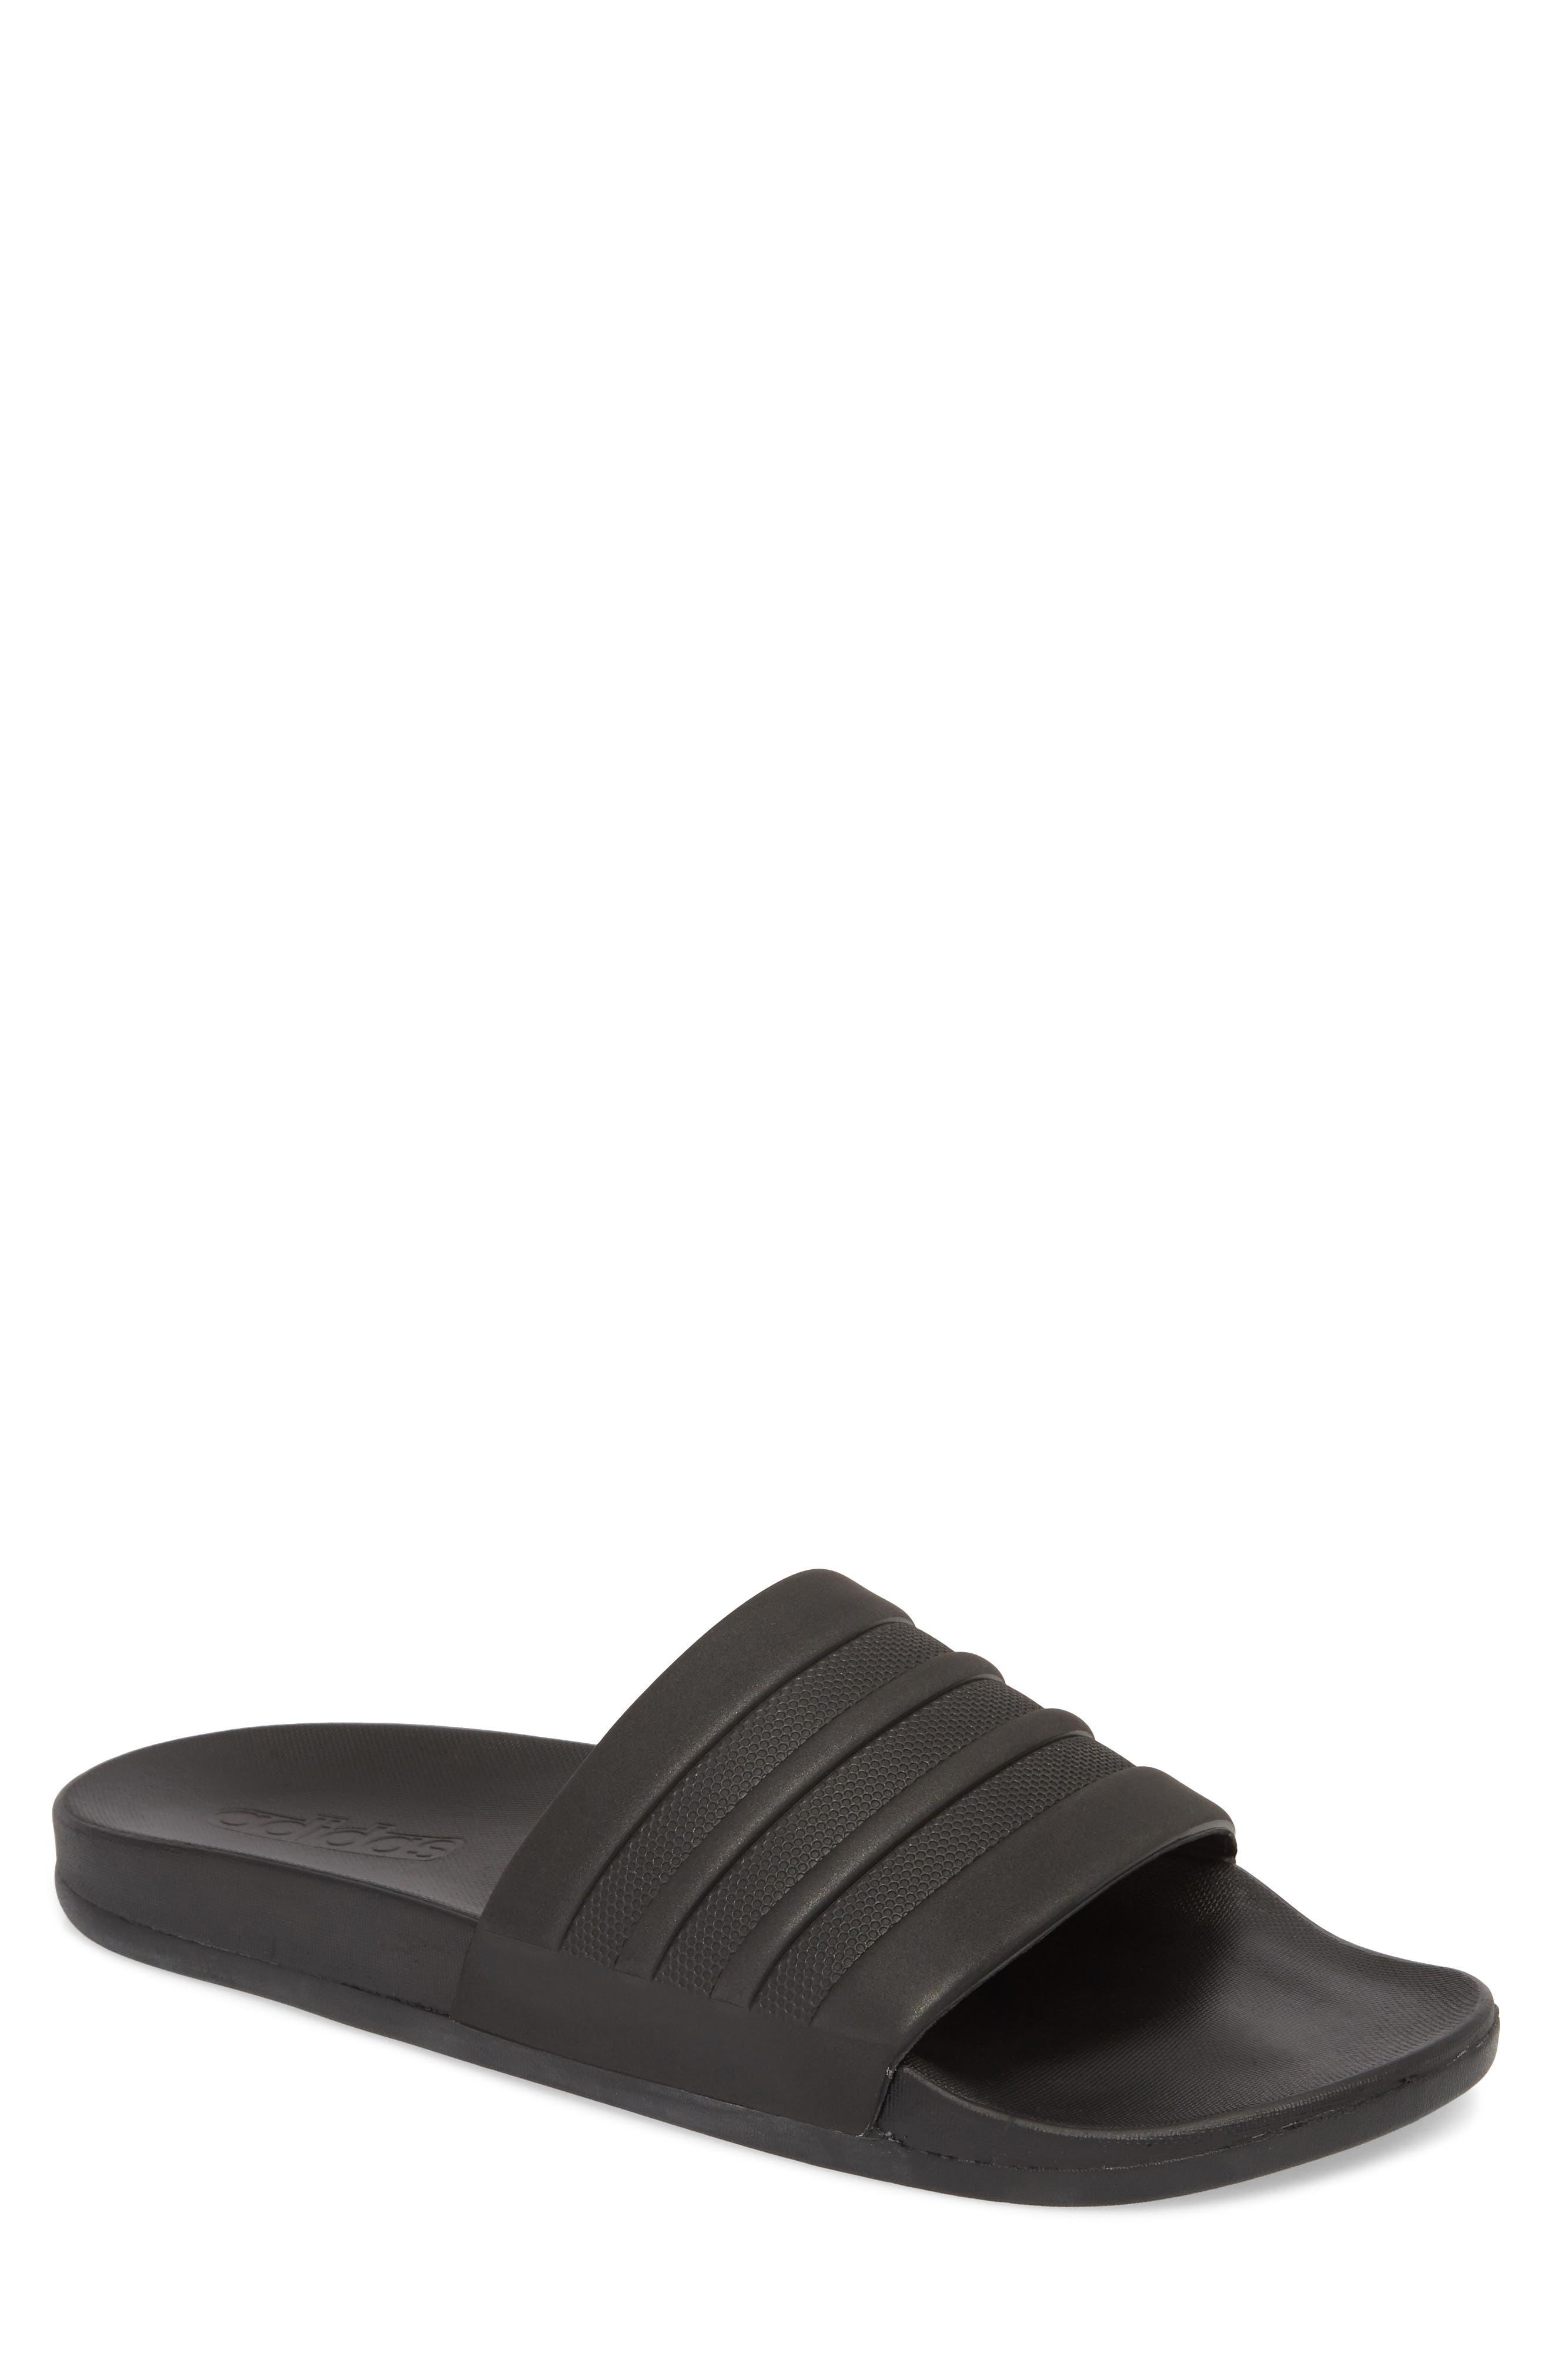 ADIDAS, Adilette Cloudfoam Mono Sport Slide Sandal, Main thumbnail 1, color, BLACK/ BLACK